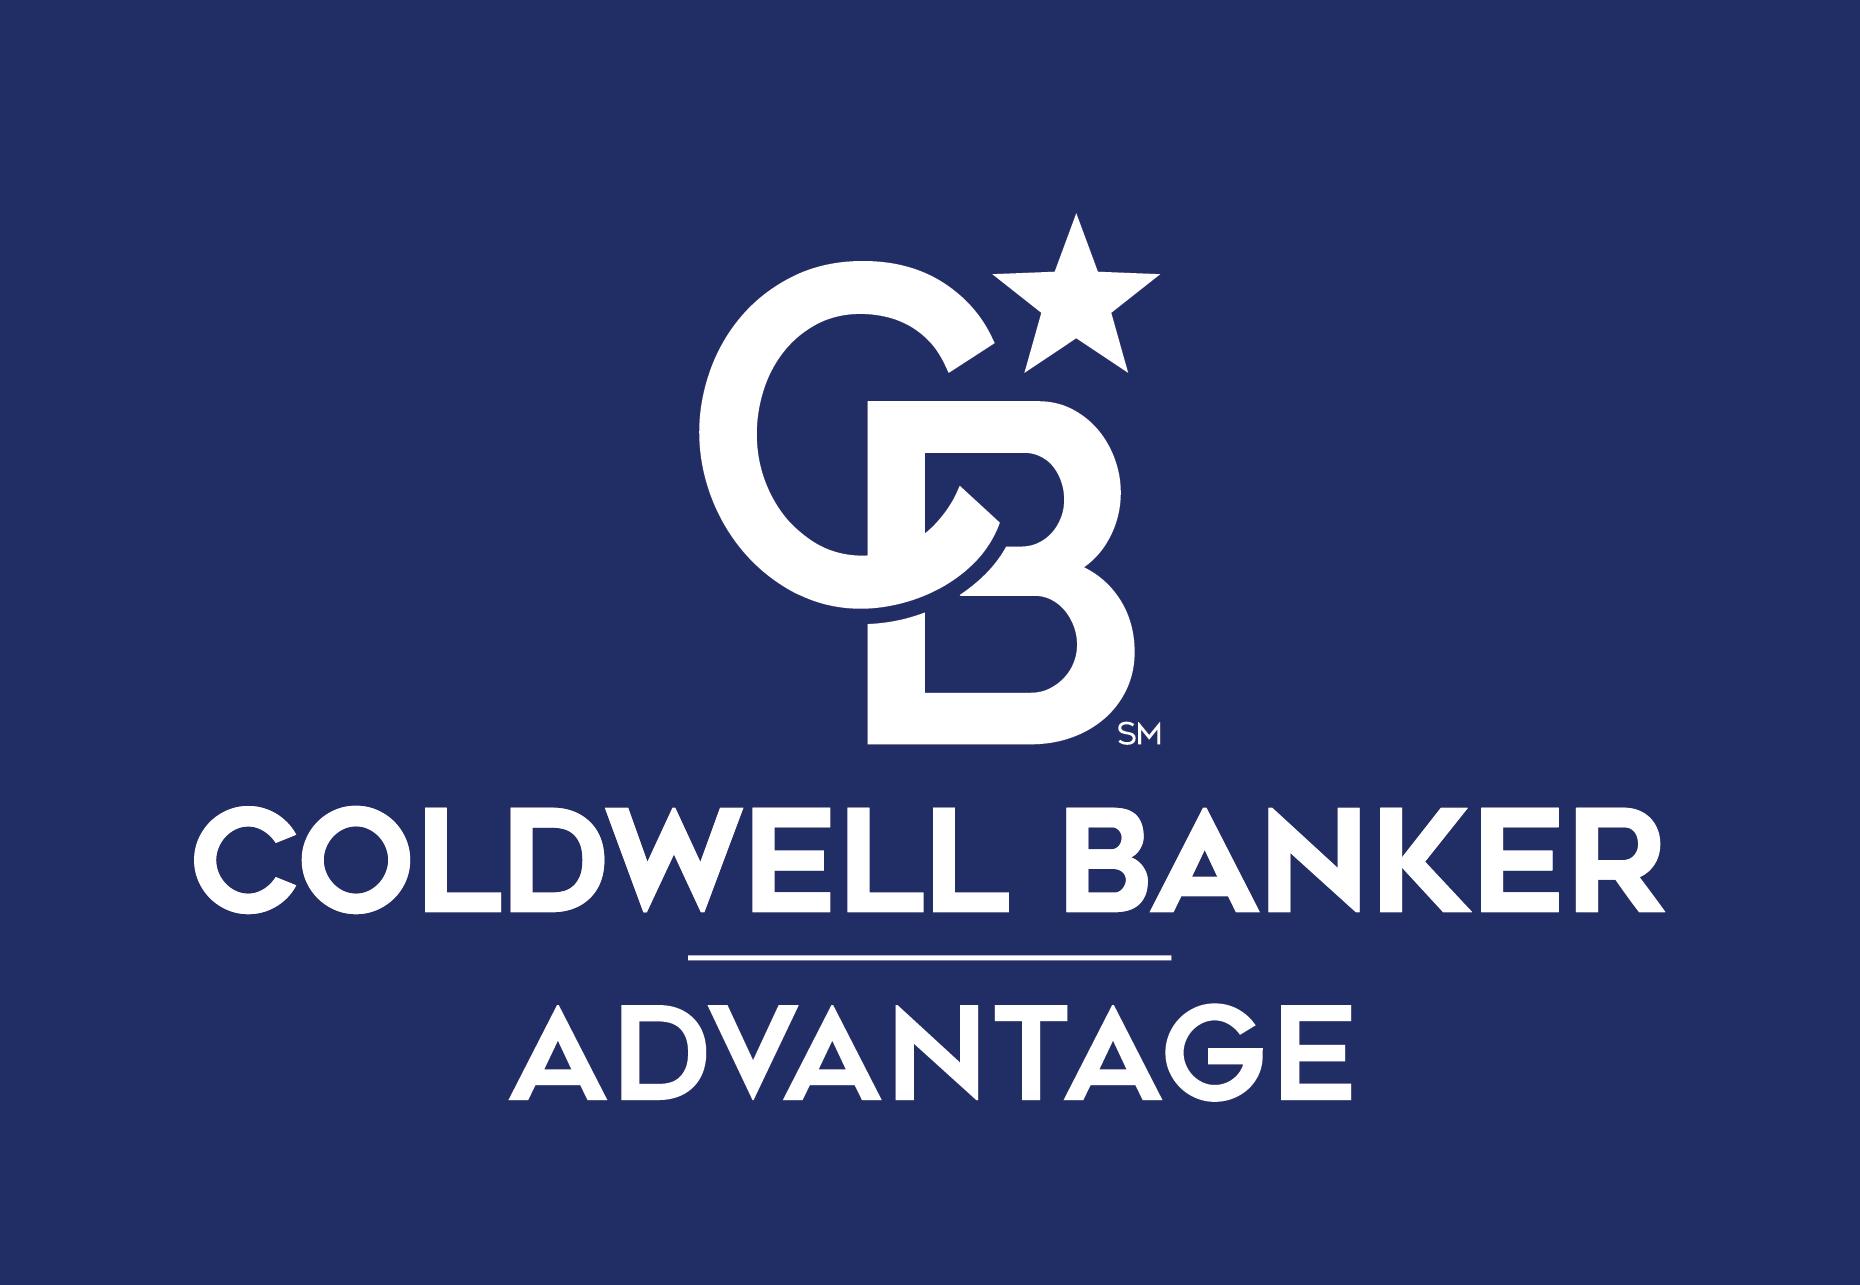 Natalie Martin - Coldwell Banker Advantage Logo